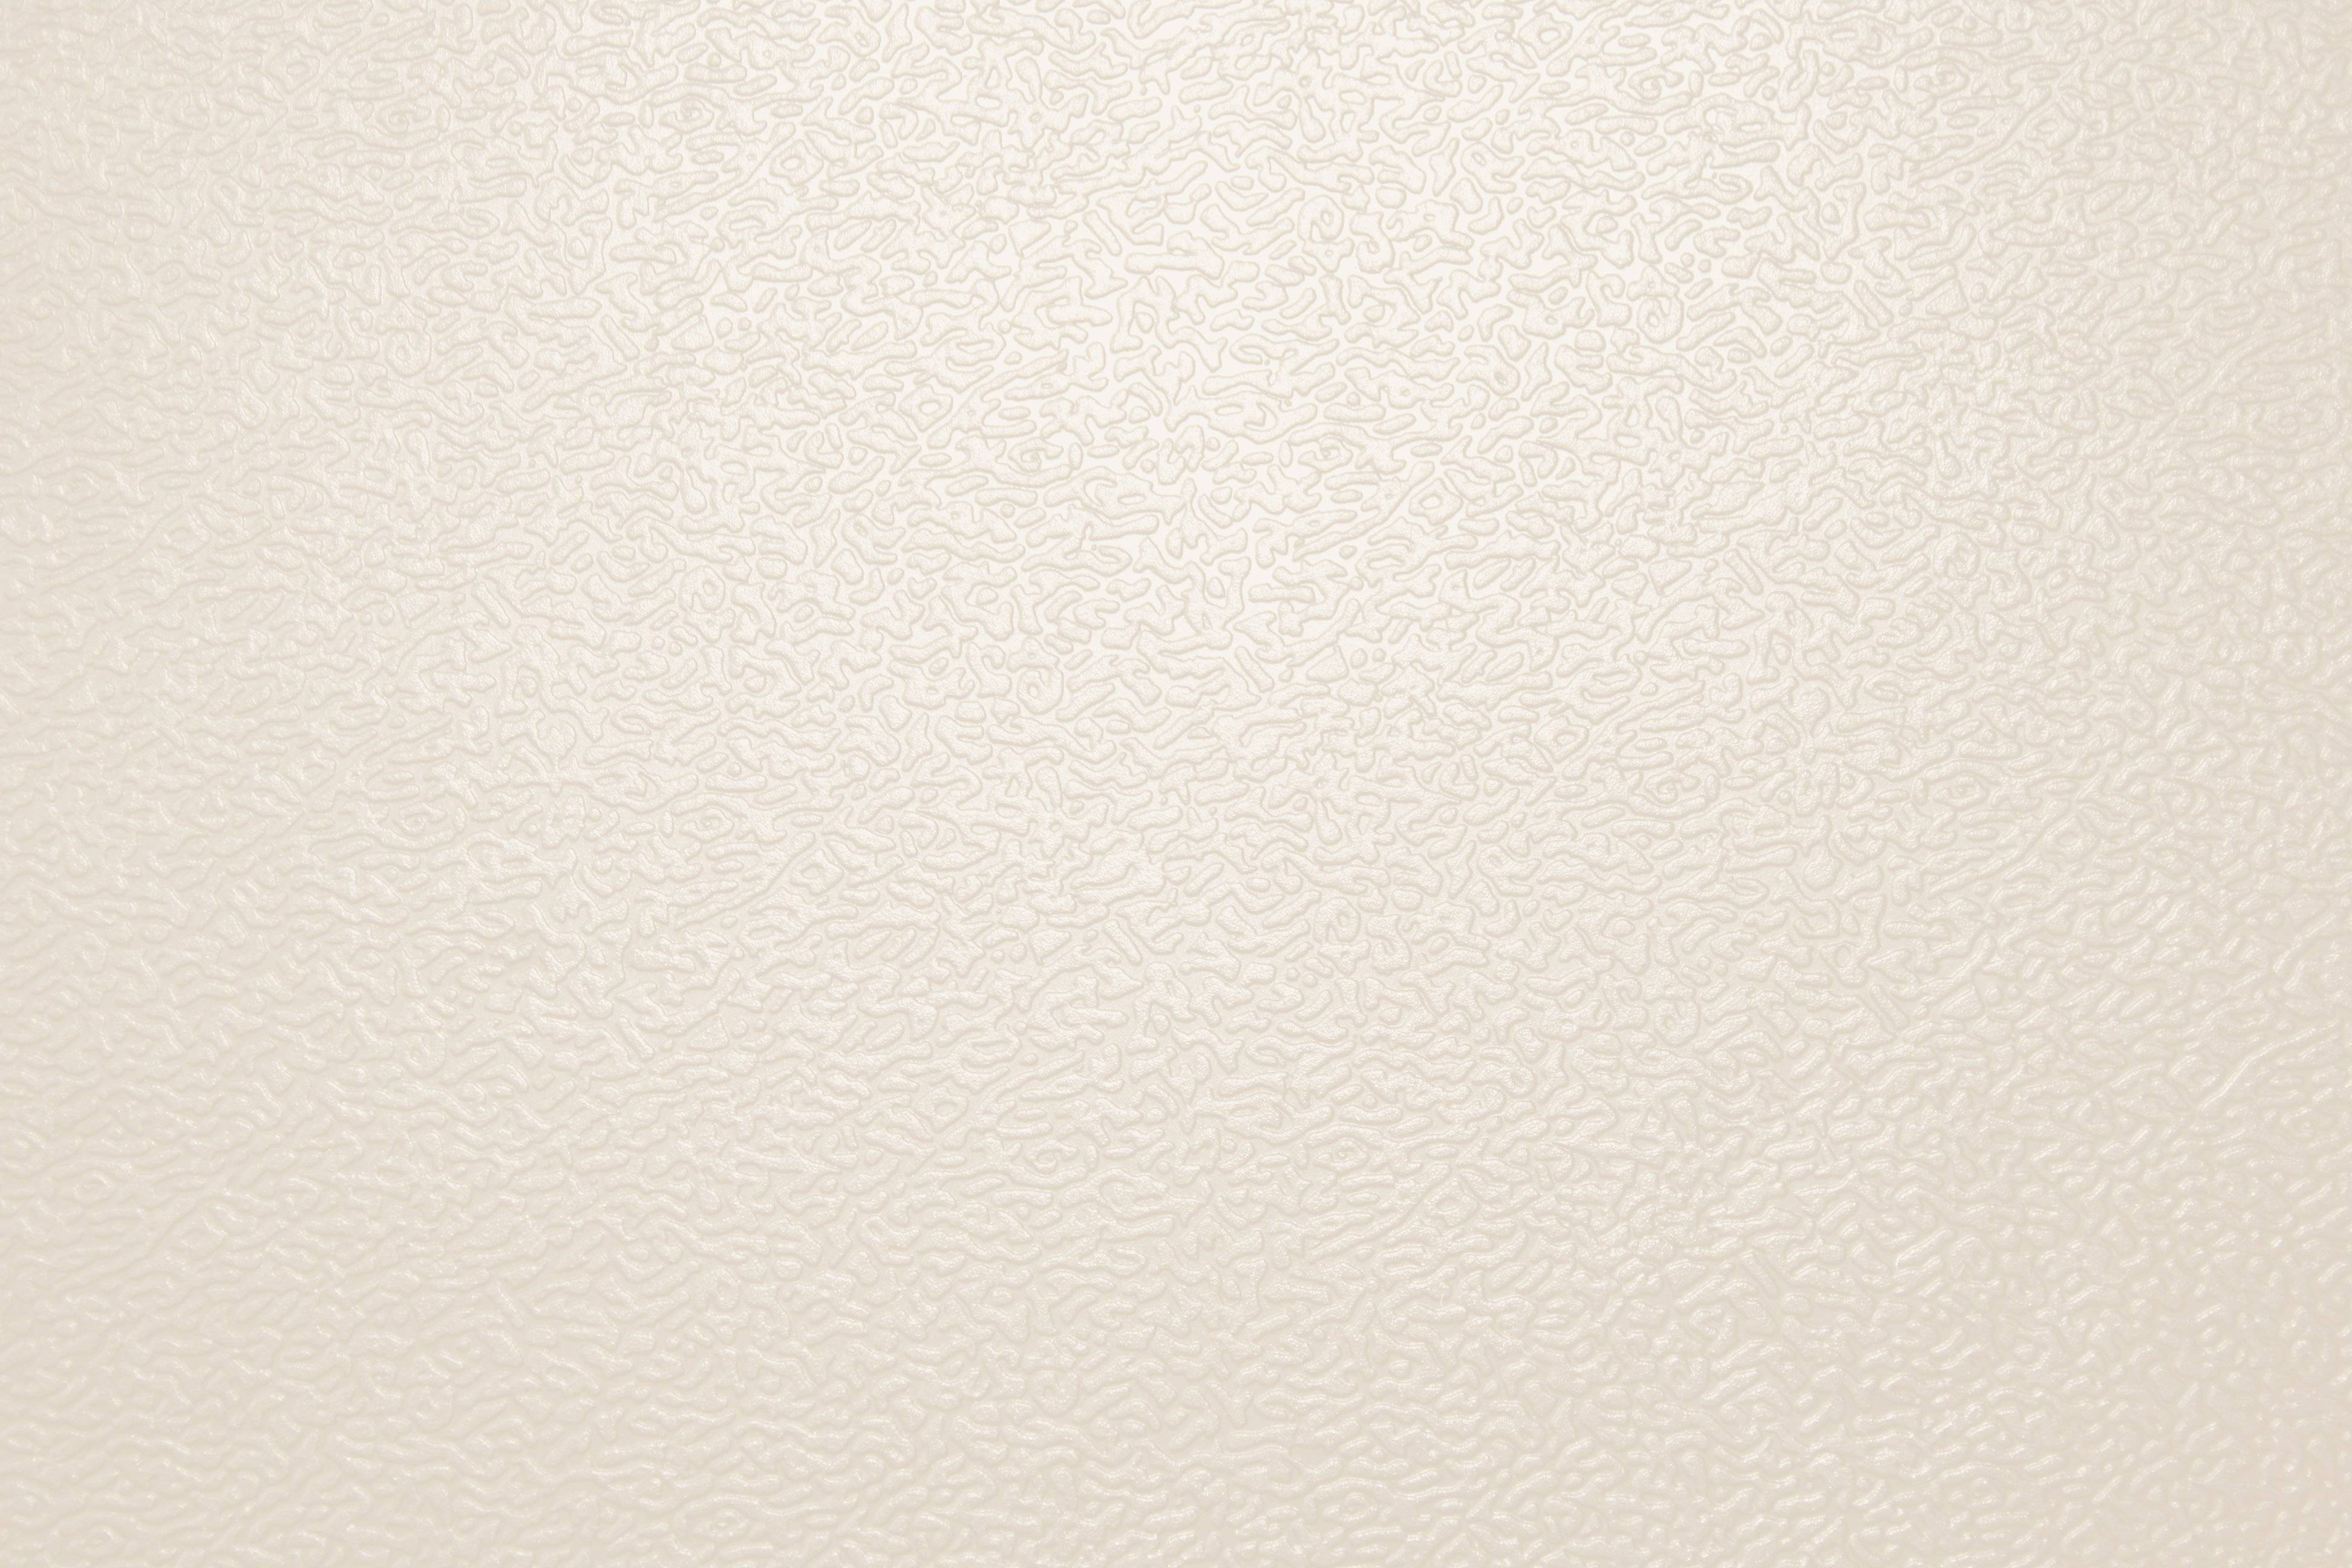 77 Cream Colored Wallpaper On Wallpapersafari